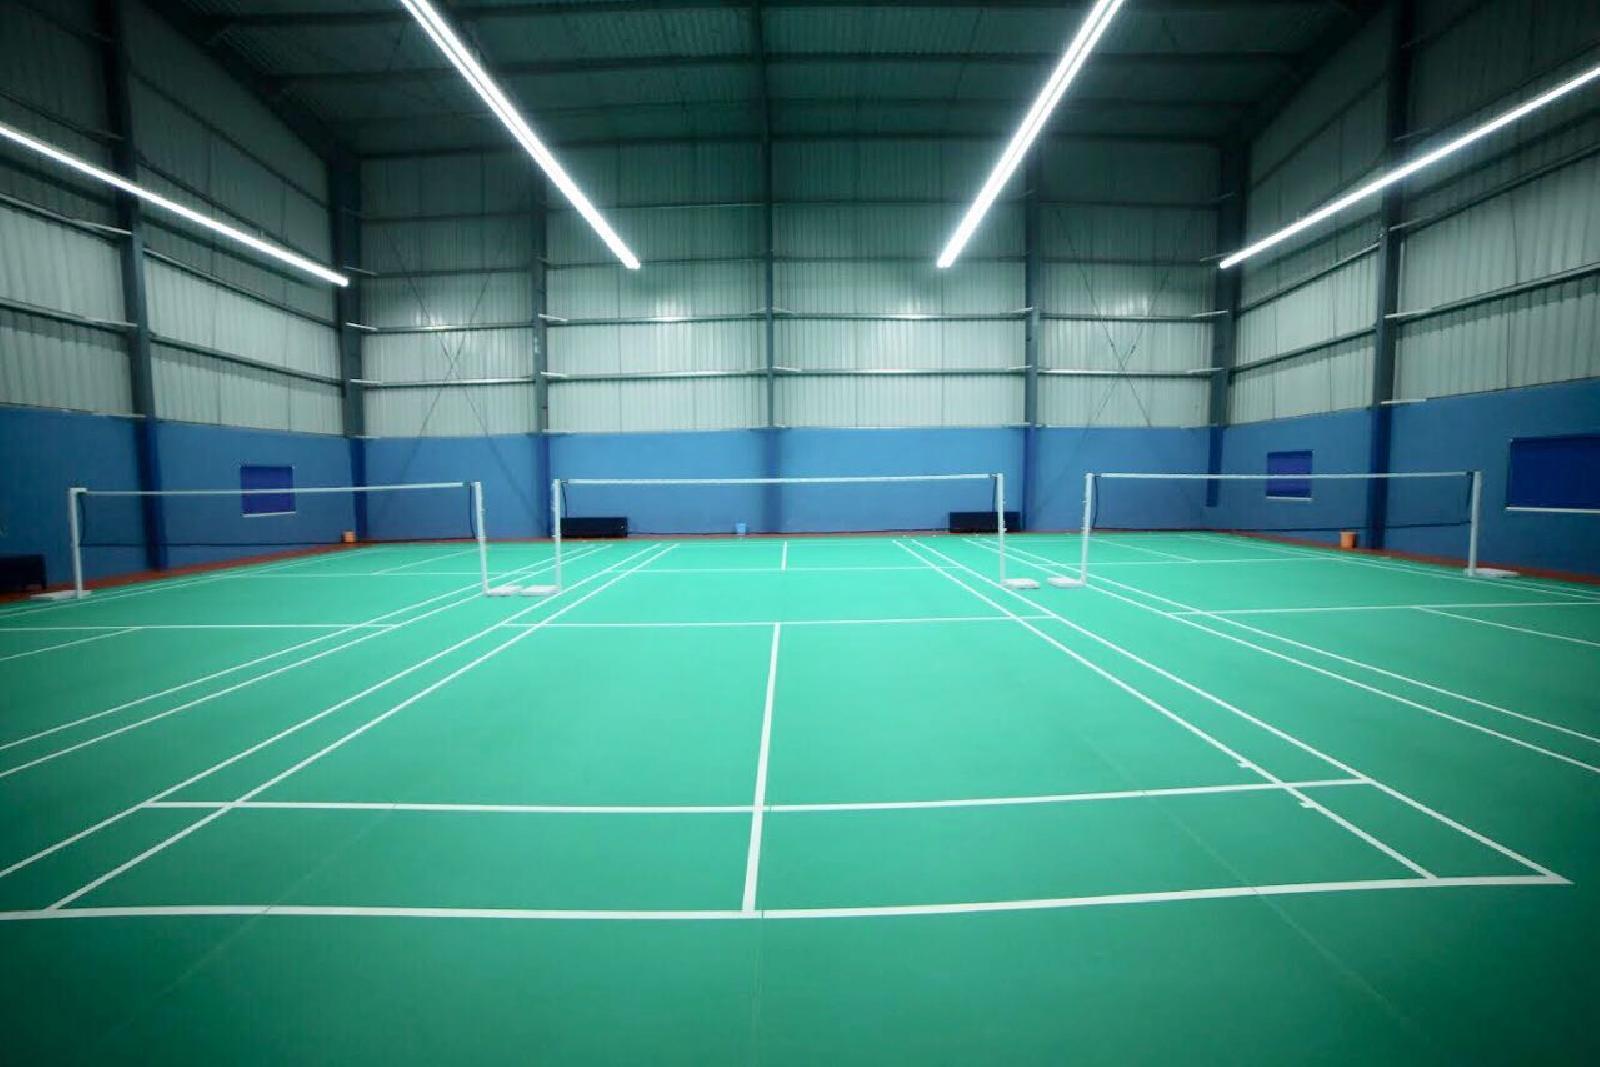 BRR ARENA BADMINTON - GW Sports App